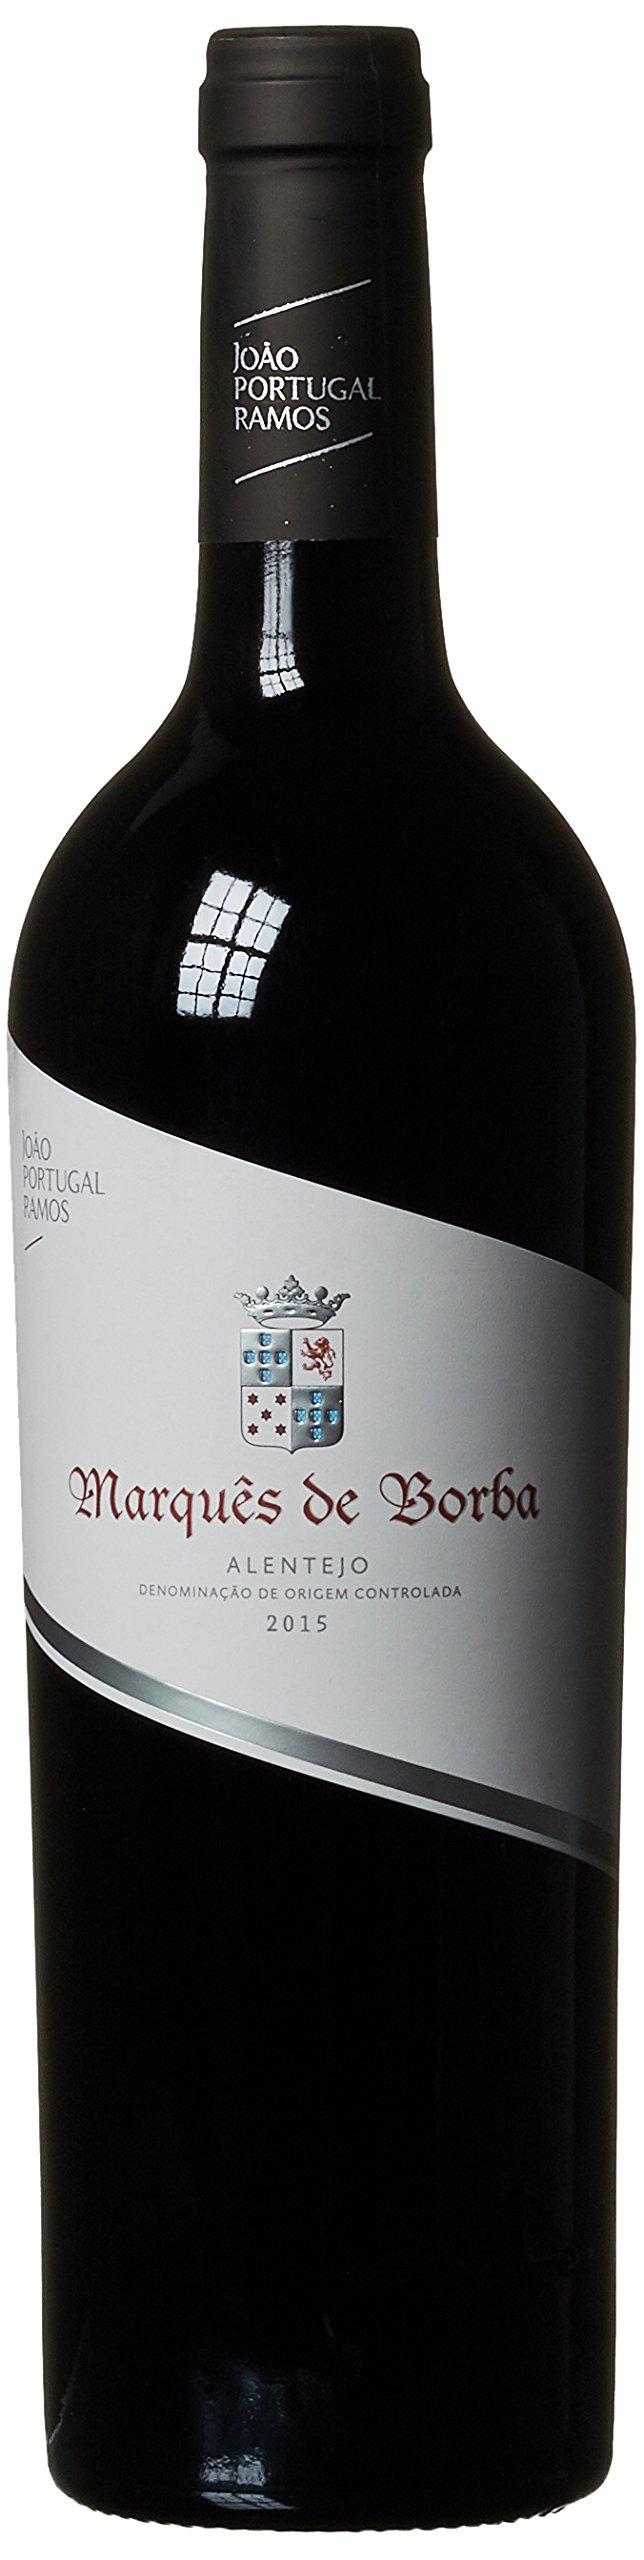 Joao-Portugal-Ramos-Marques-de-Borba-Tinto-Cuvee-2015-trocken-3-x-075-l